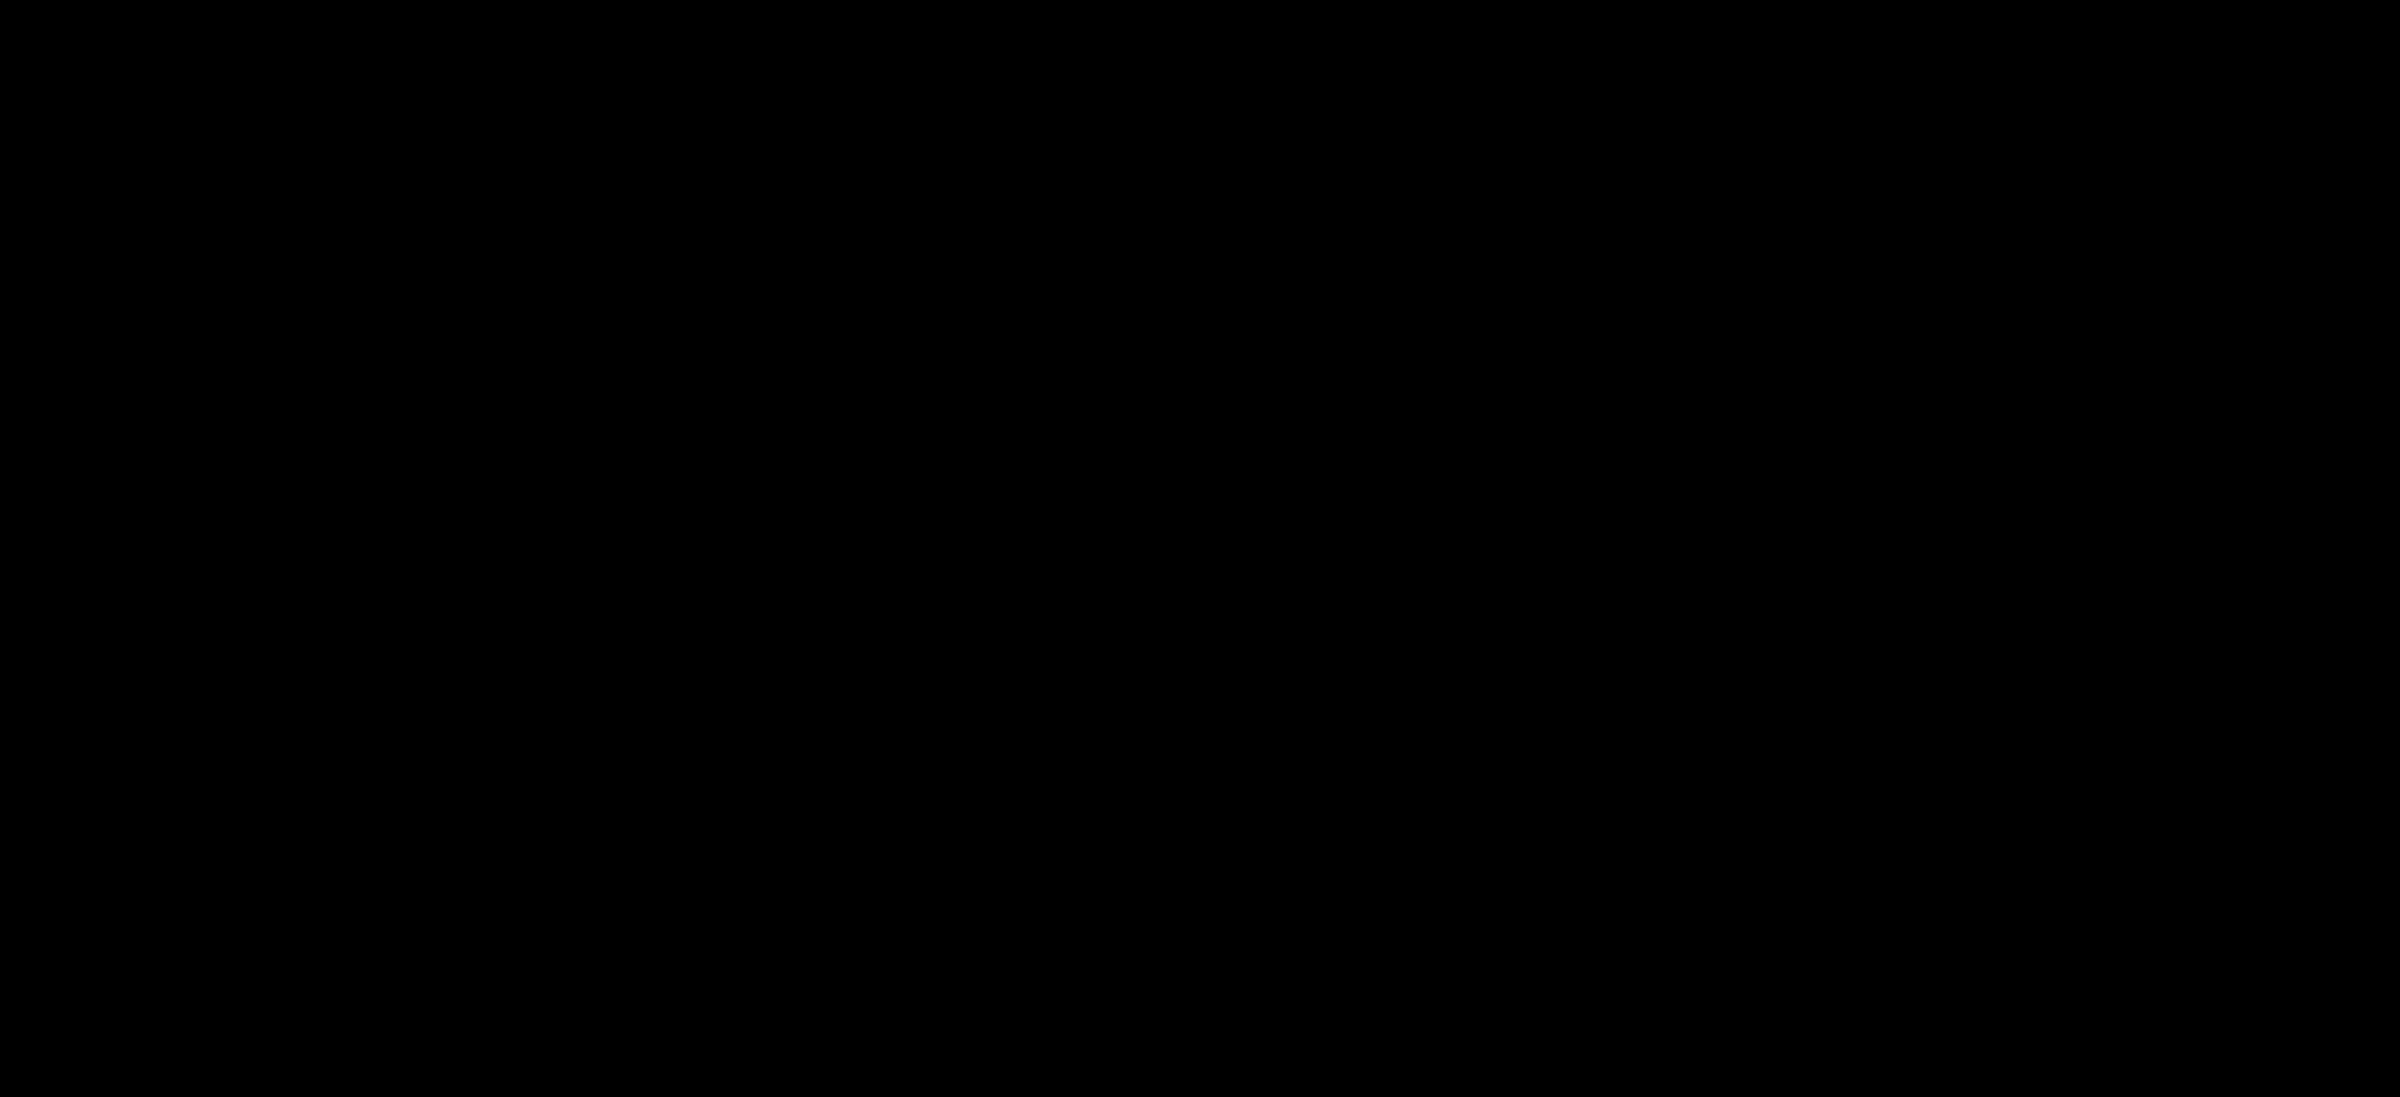 2400x1097 Ant black and white clip art ants biezumd